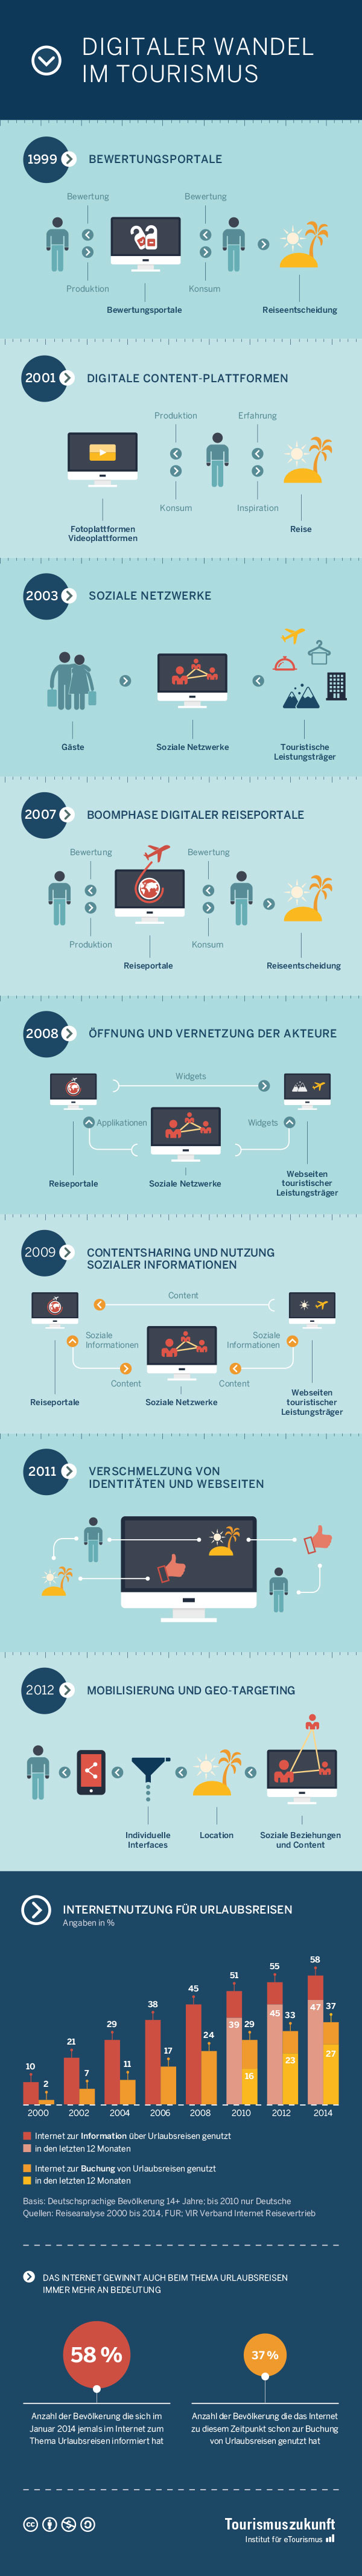 Infografik - digitaler Wandel im Tourismus